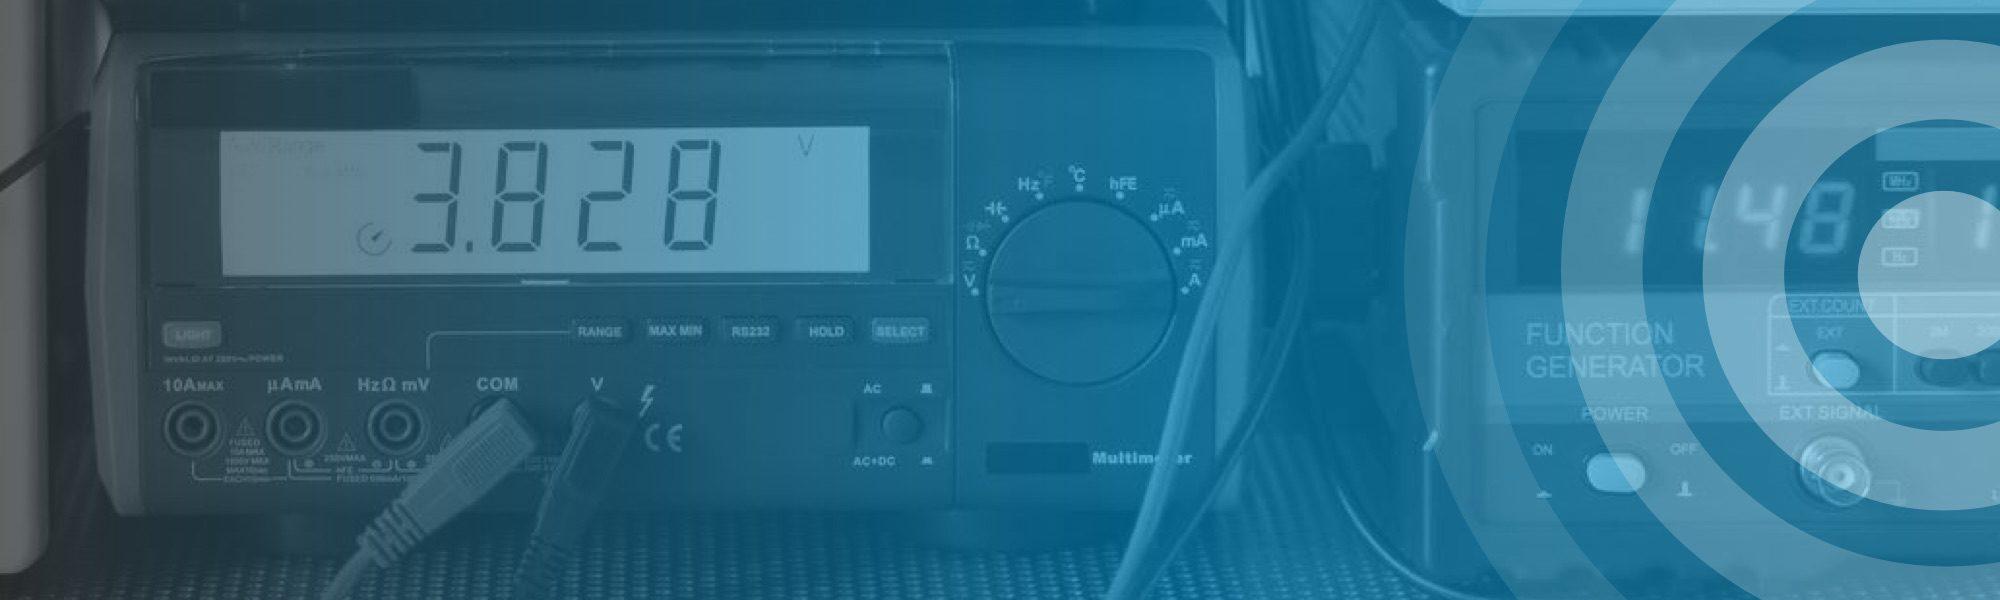 General Radiotelephone Operators License Course Image